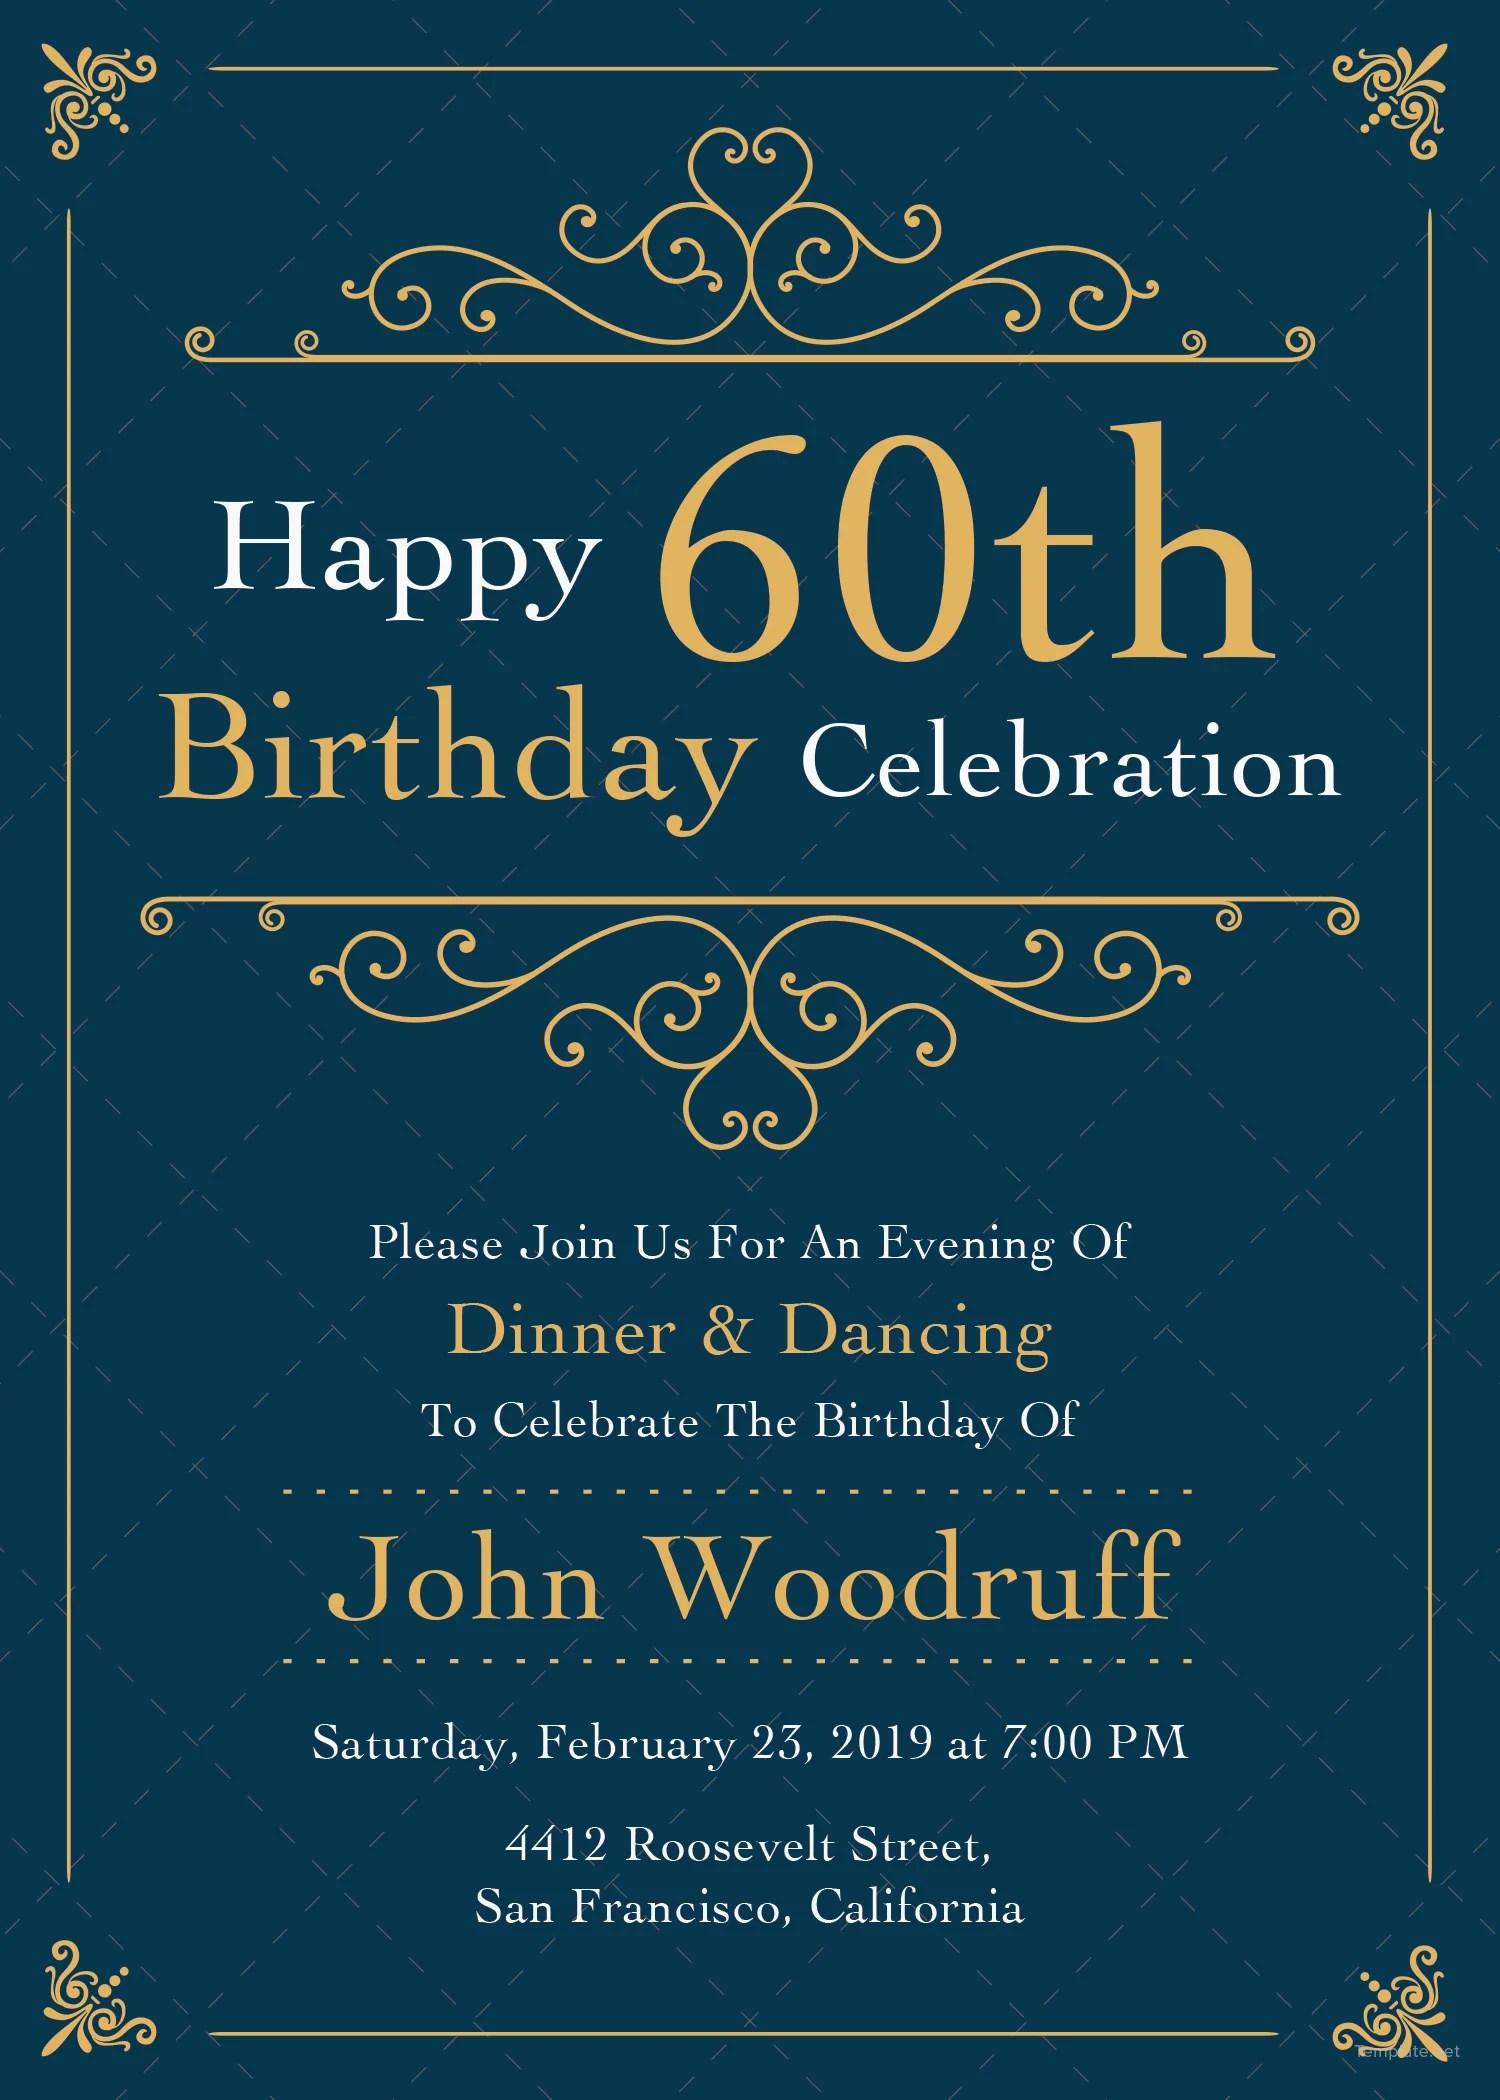 Free Elegant Invitation Template In Microsoft Word